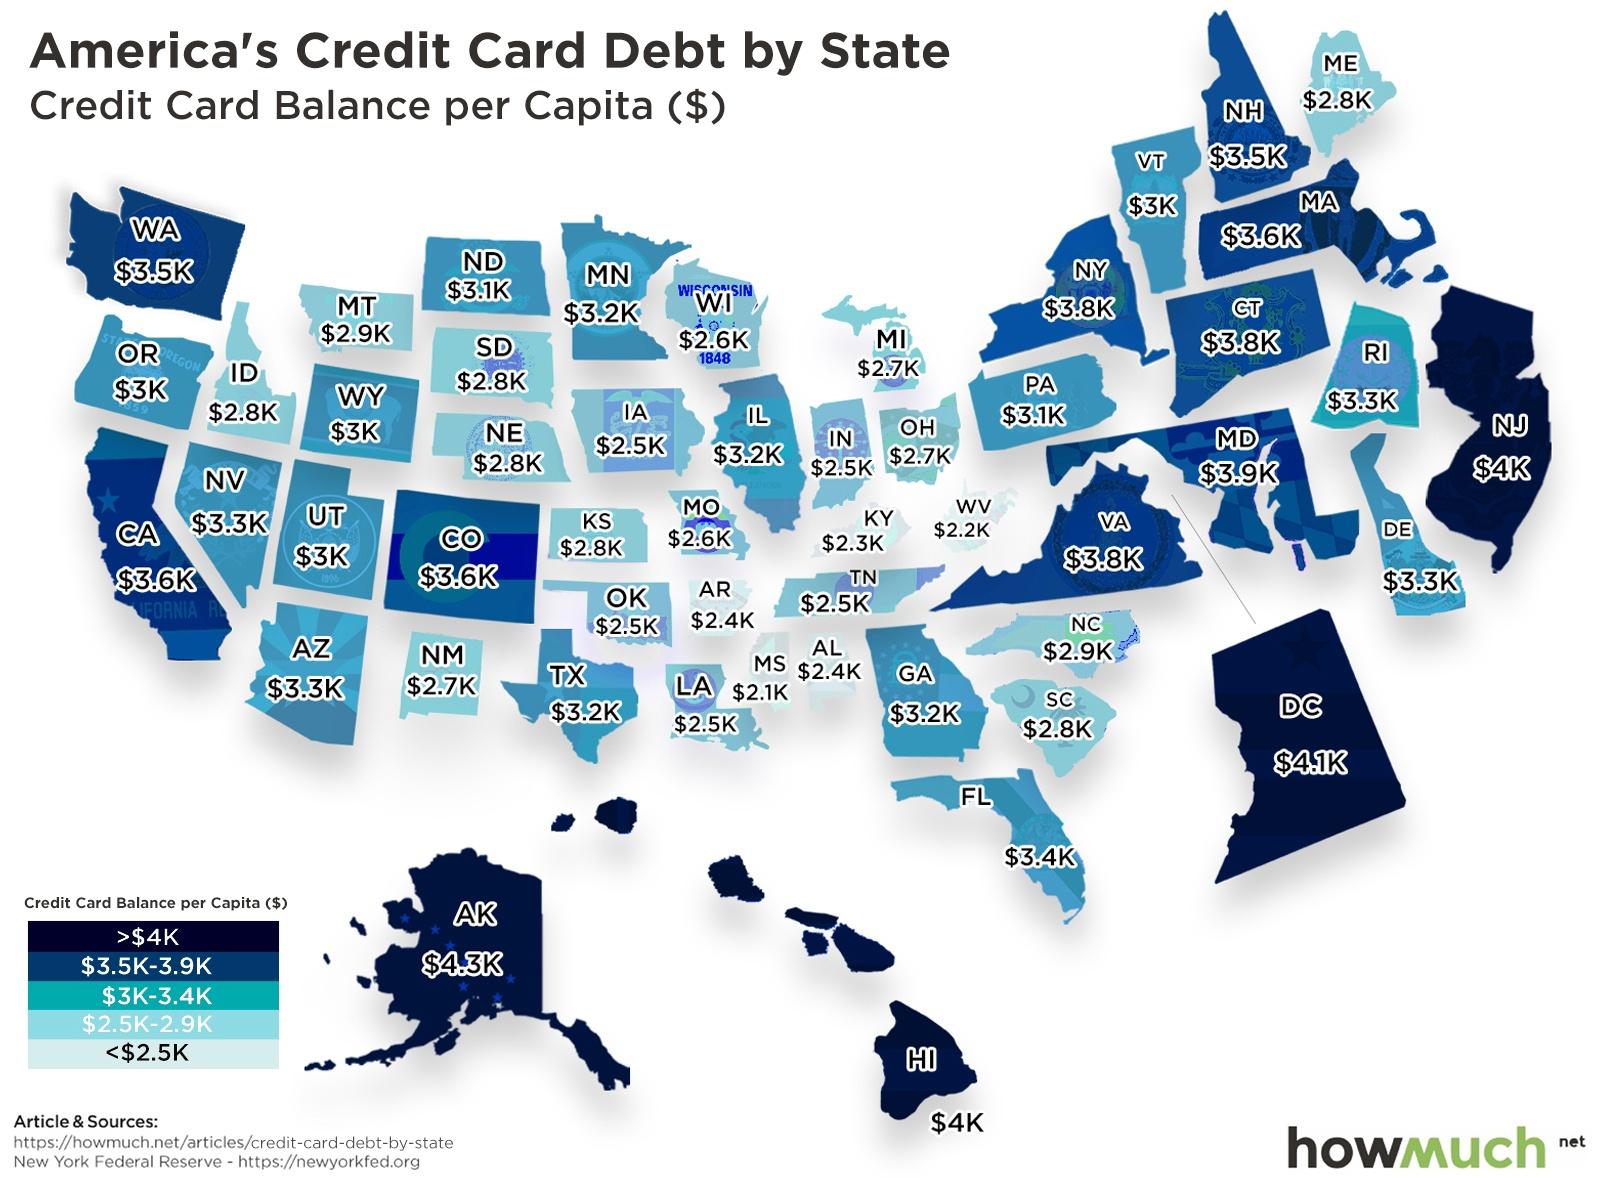 Credit Card Debt Burden